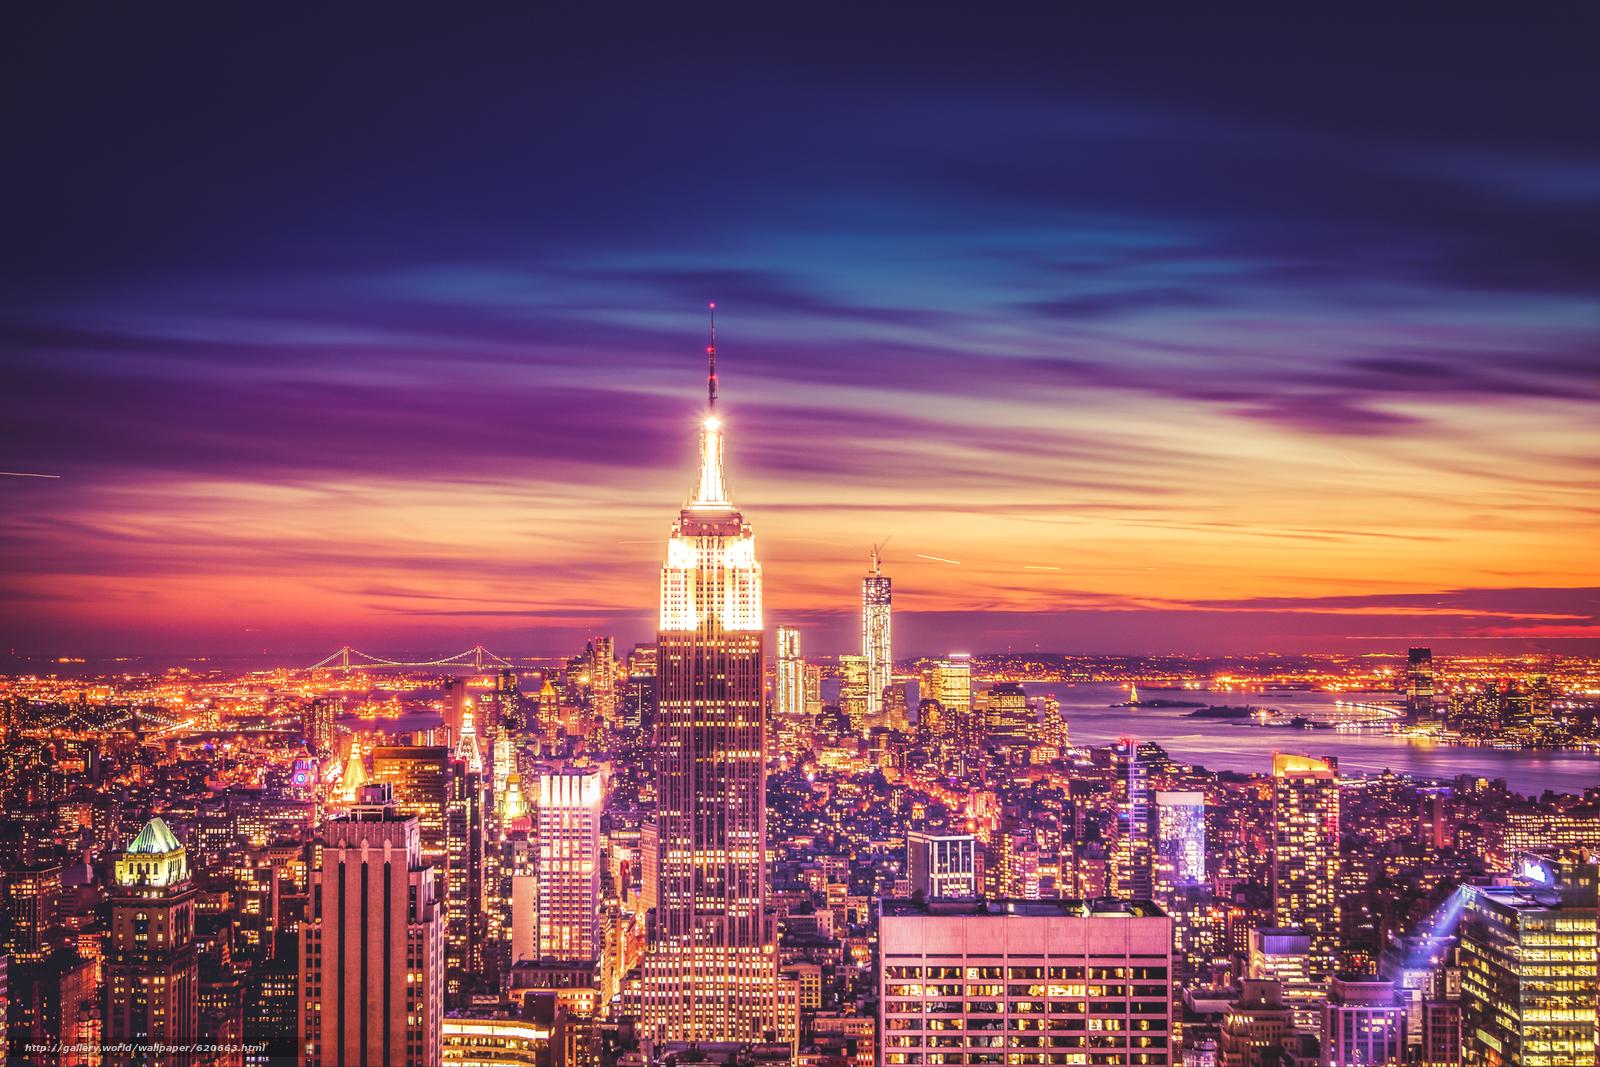 Empire State Building, Manhattan, New York City, Эмпайр-стейт-билдинг, Манхэттен, Нью-Йорк, ночной город, небоскрёбы, здания, панорама